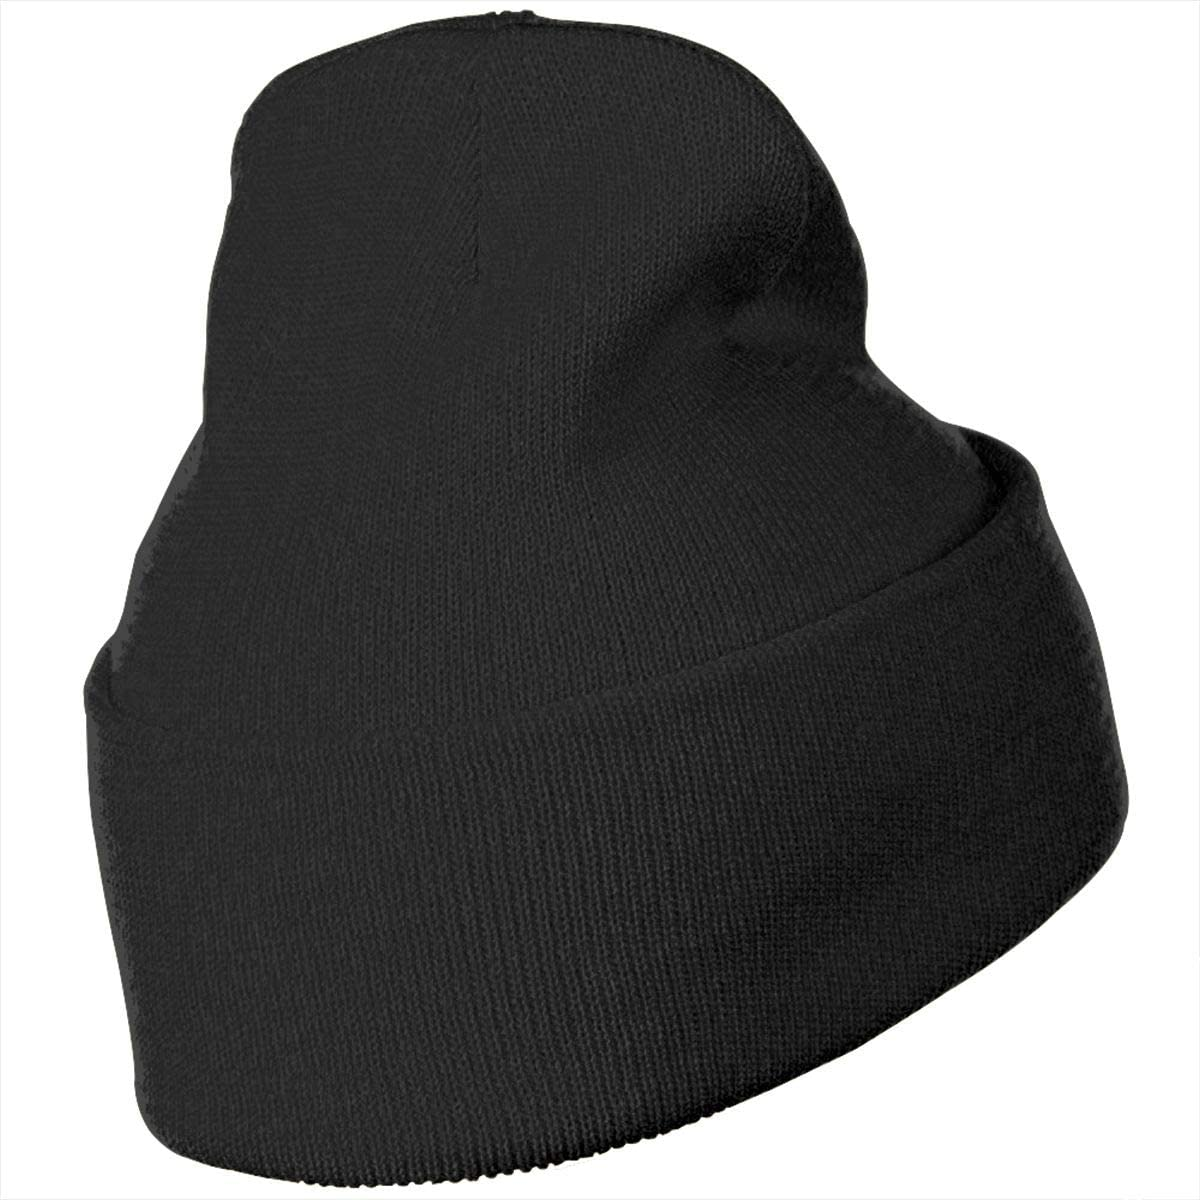 Washington Dc with USA Flag Beanie Hat Men /& Women Winter Warm Cap Headwear Skull Beanie